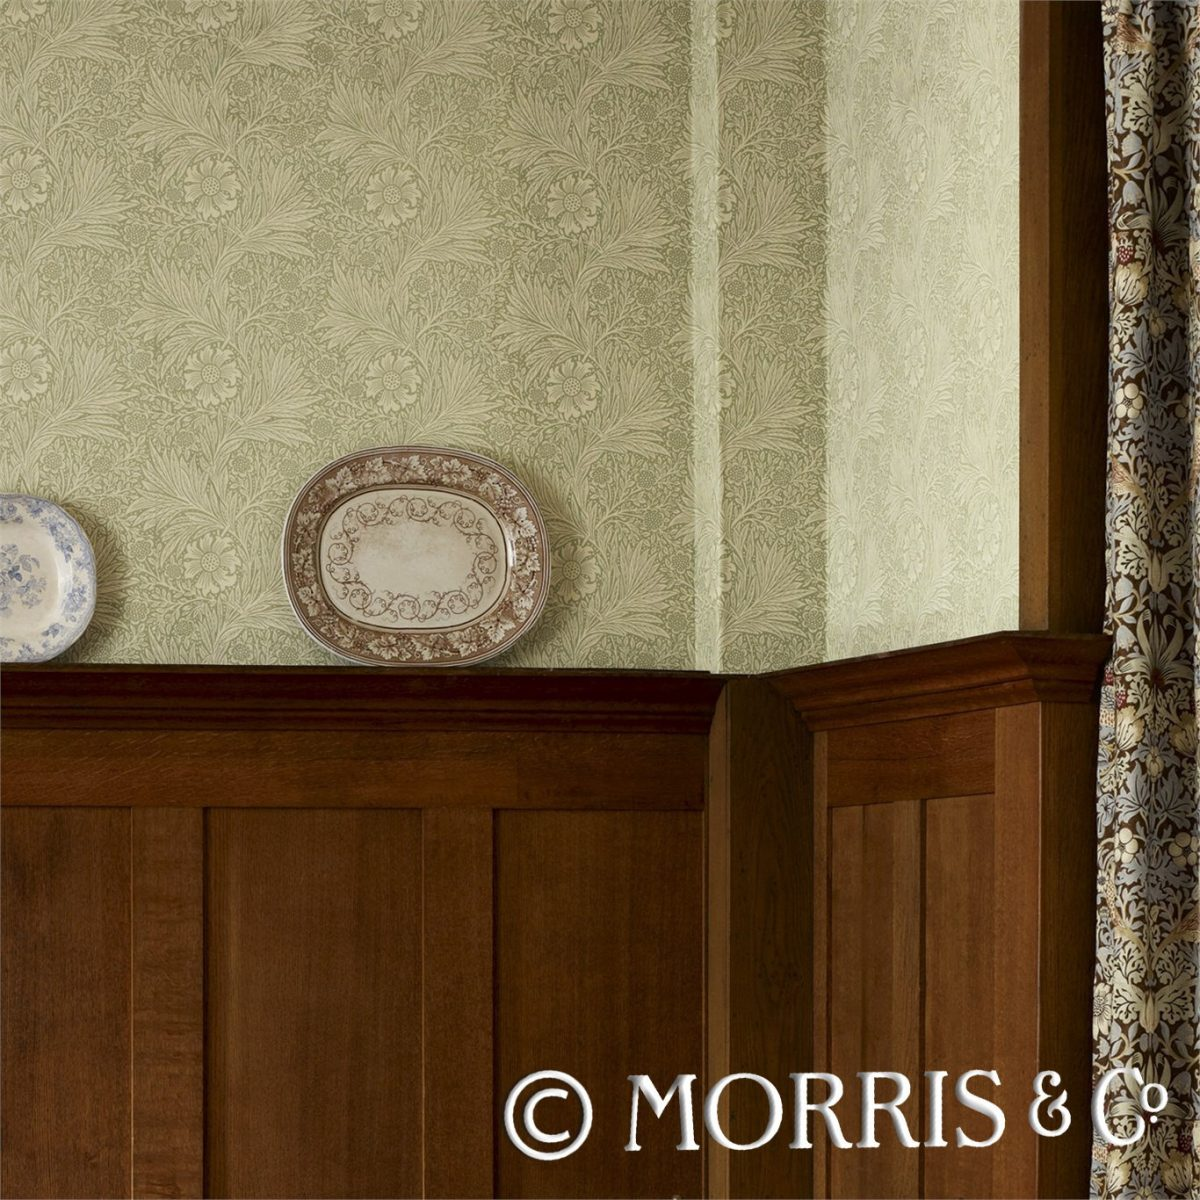 Morris & Co Tapet Marigold Wedgwood